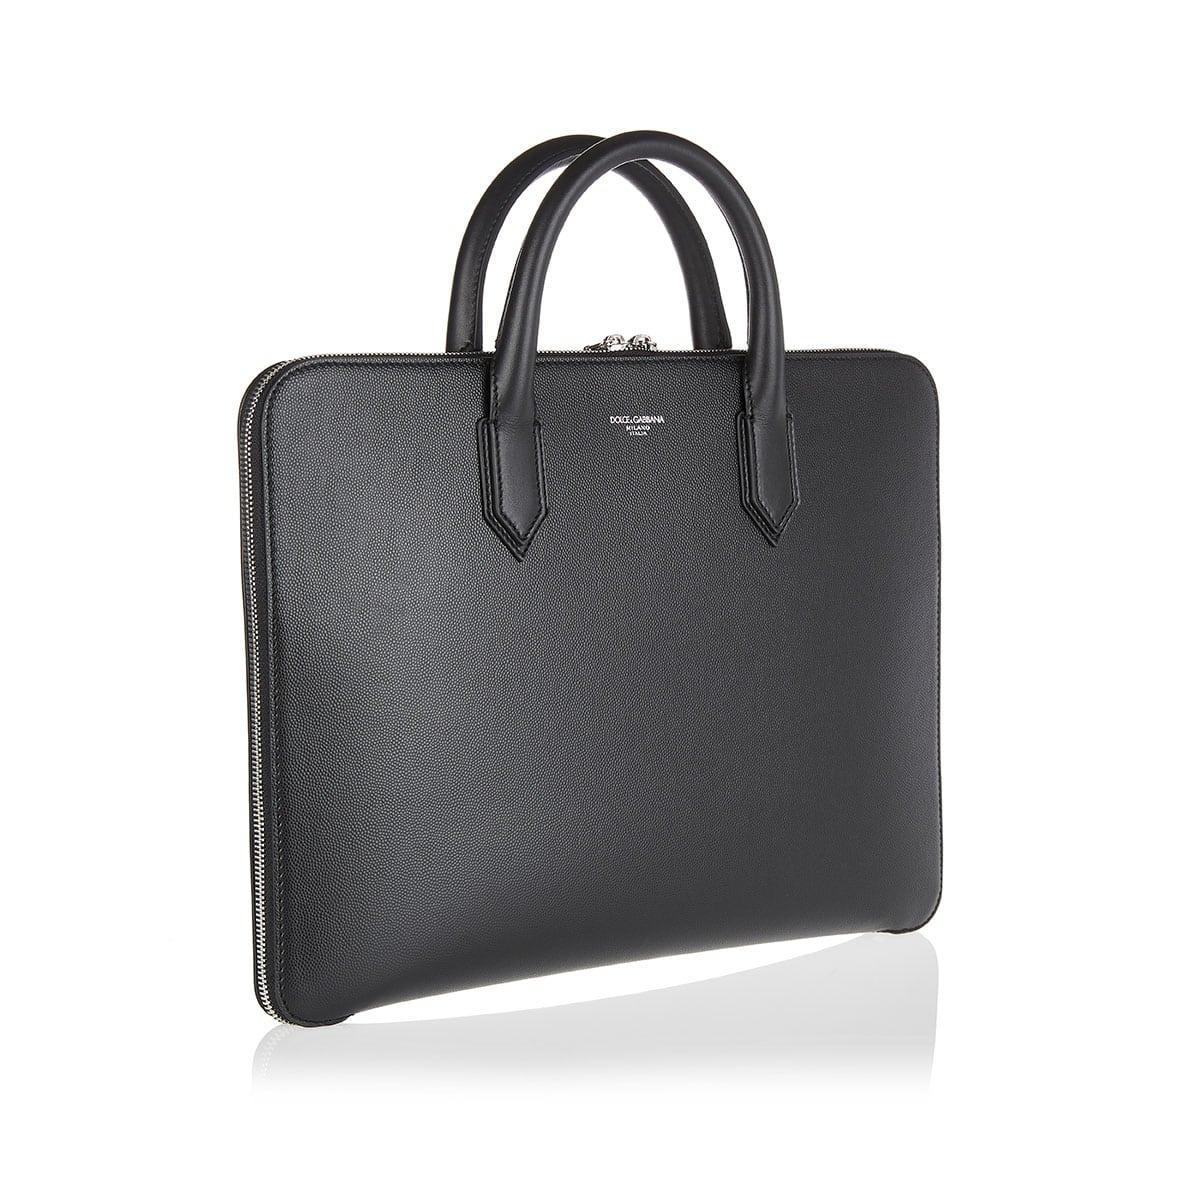 Gotico leather briefcase